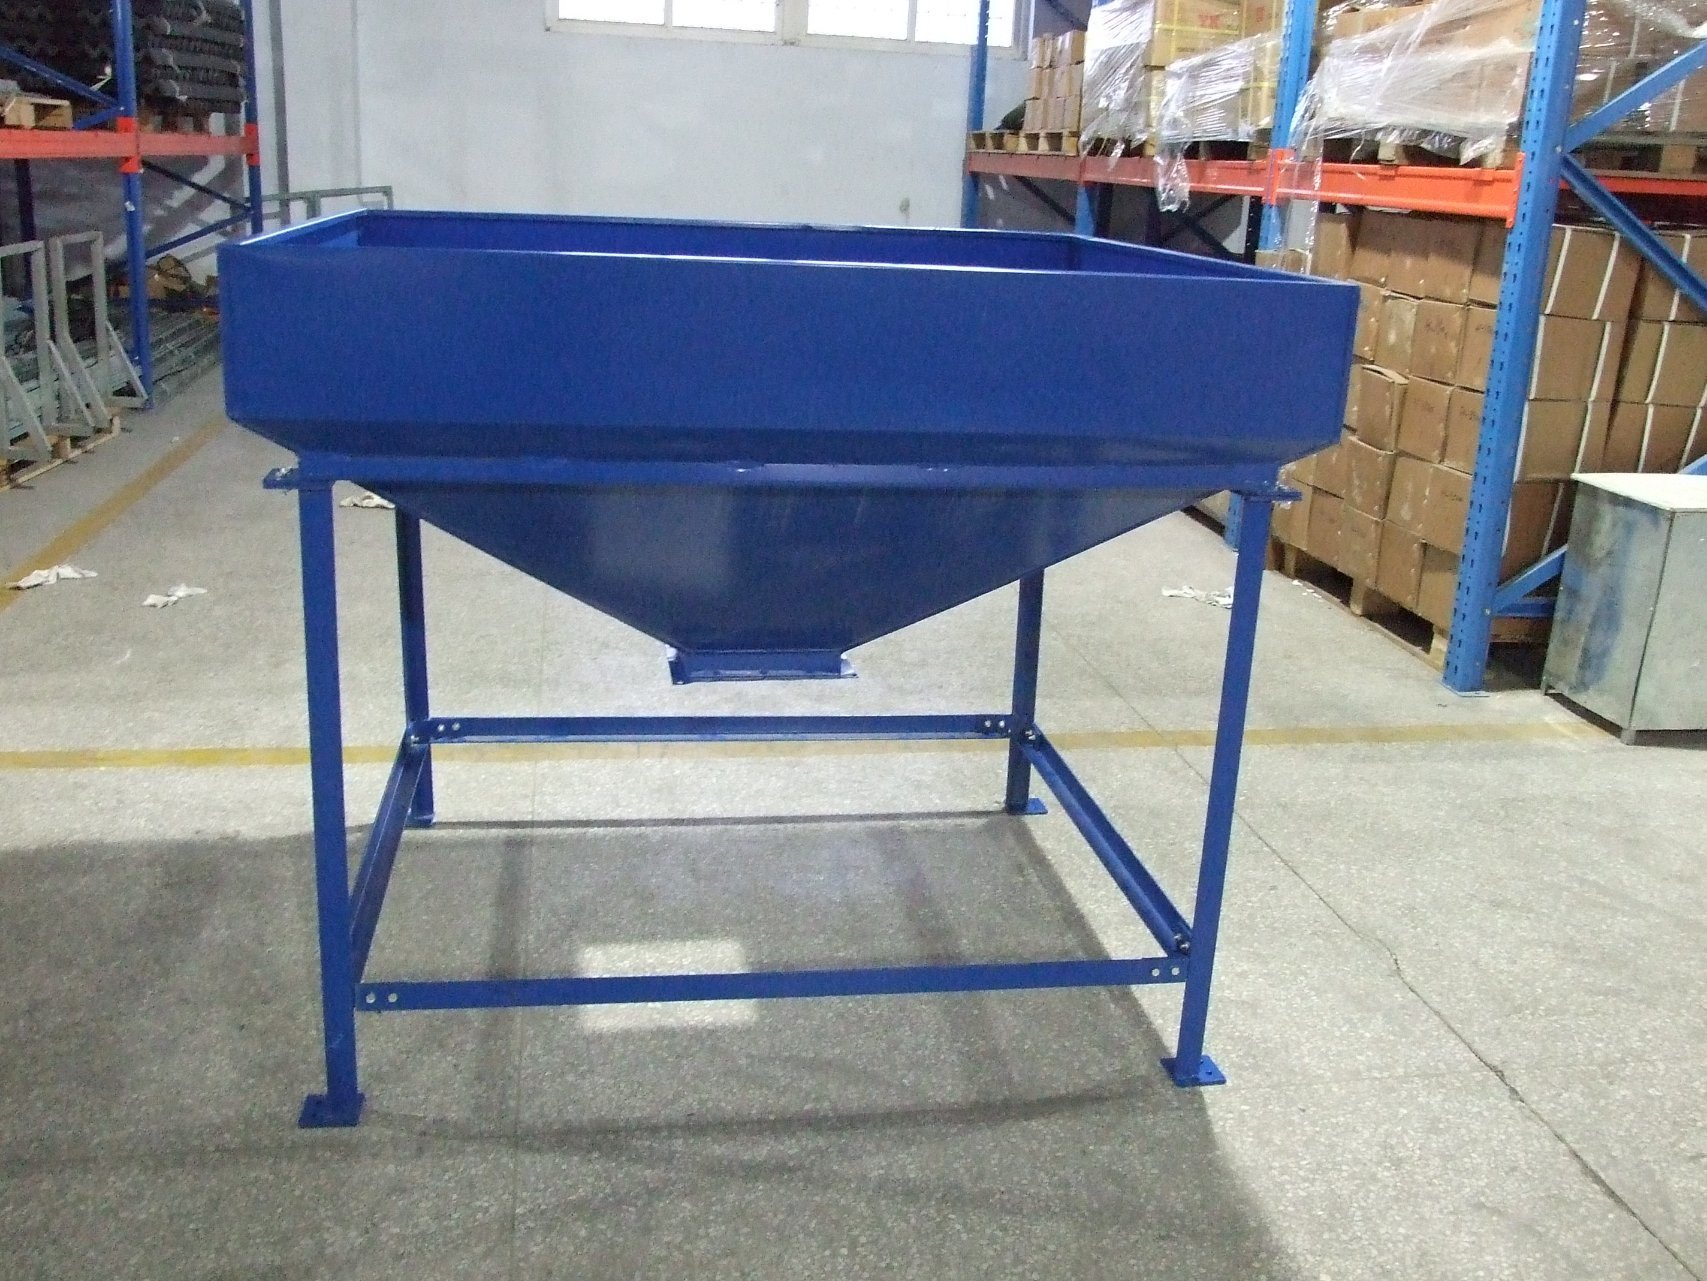 Full Set Chicken Farm Equipment for Broiler/Layer/Breeder Chicken